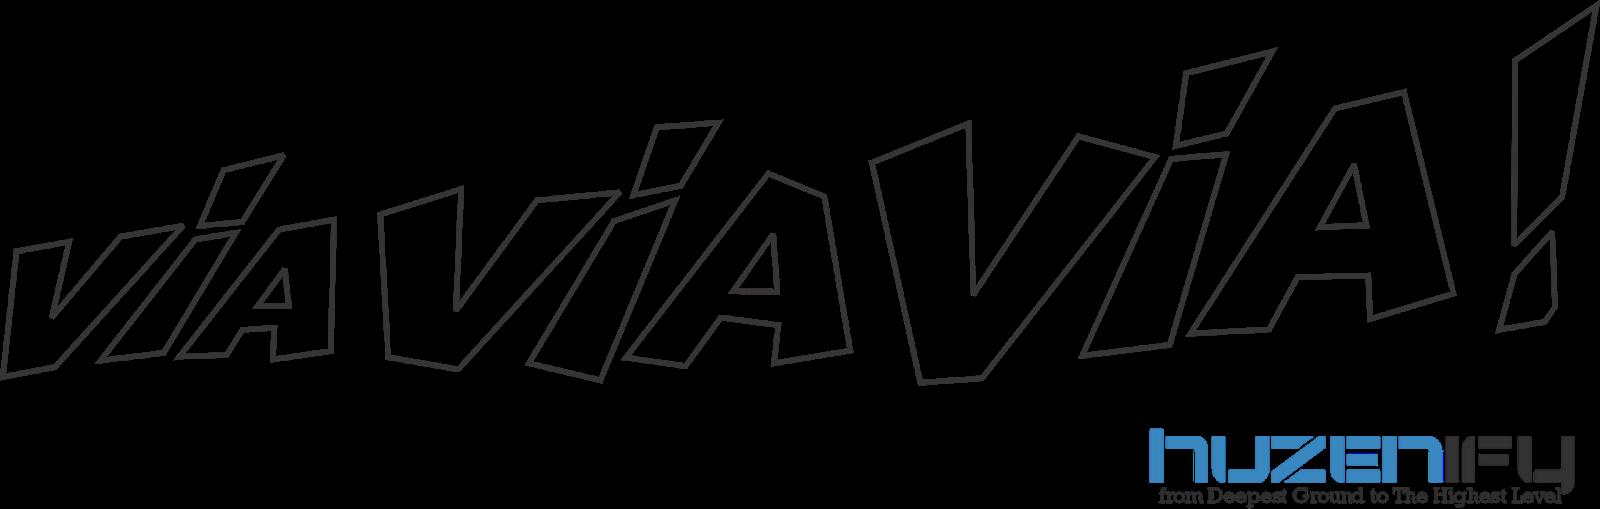 via via via logo vector png dari helm valentino rossi